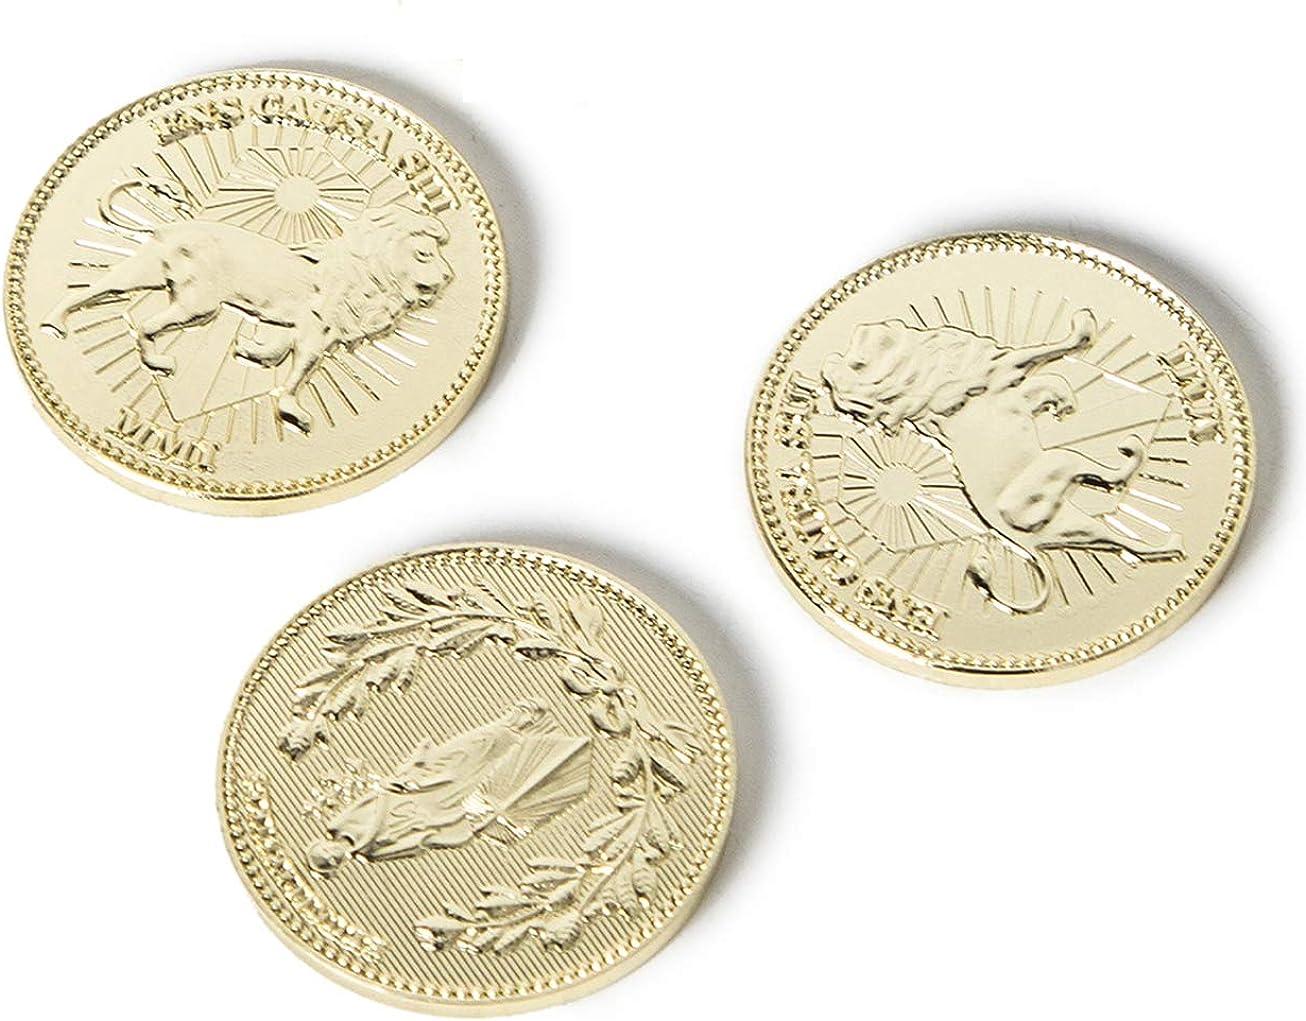 Gold Coins, Collecting Coins Golden Metal Coin 3 Pcs